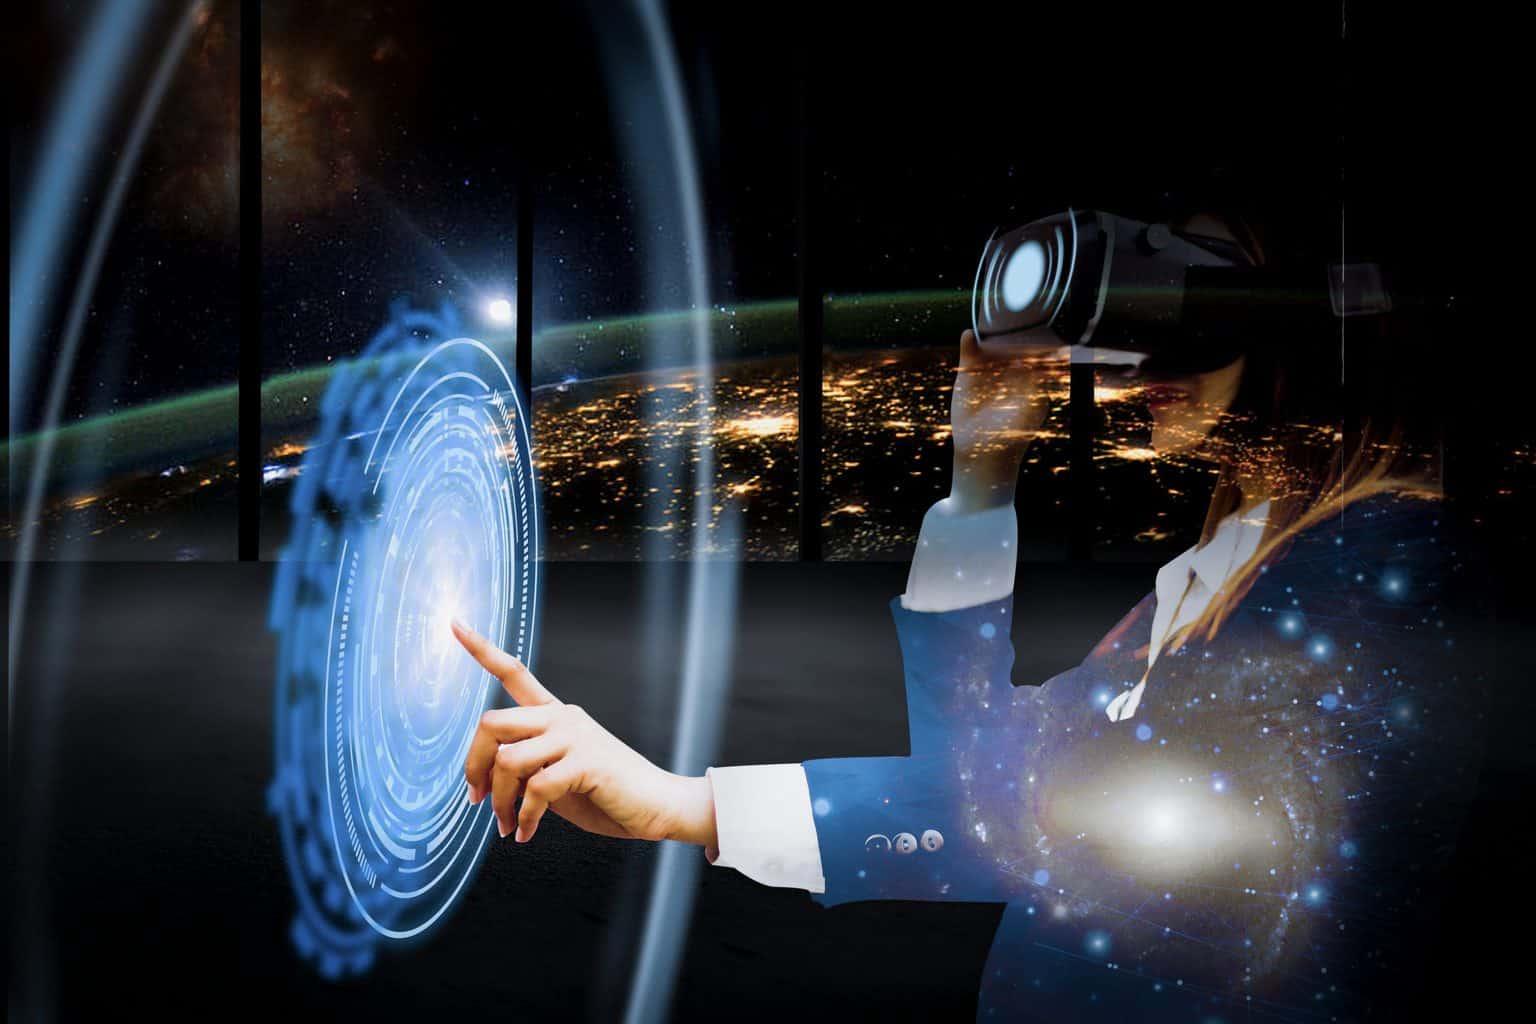 vr goggles disruptive technology